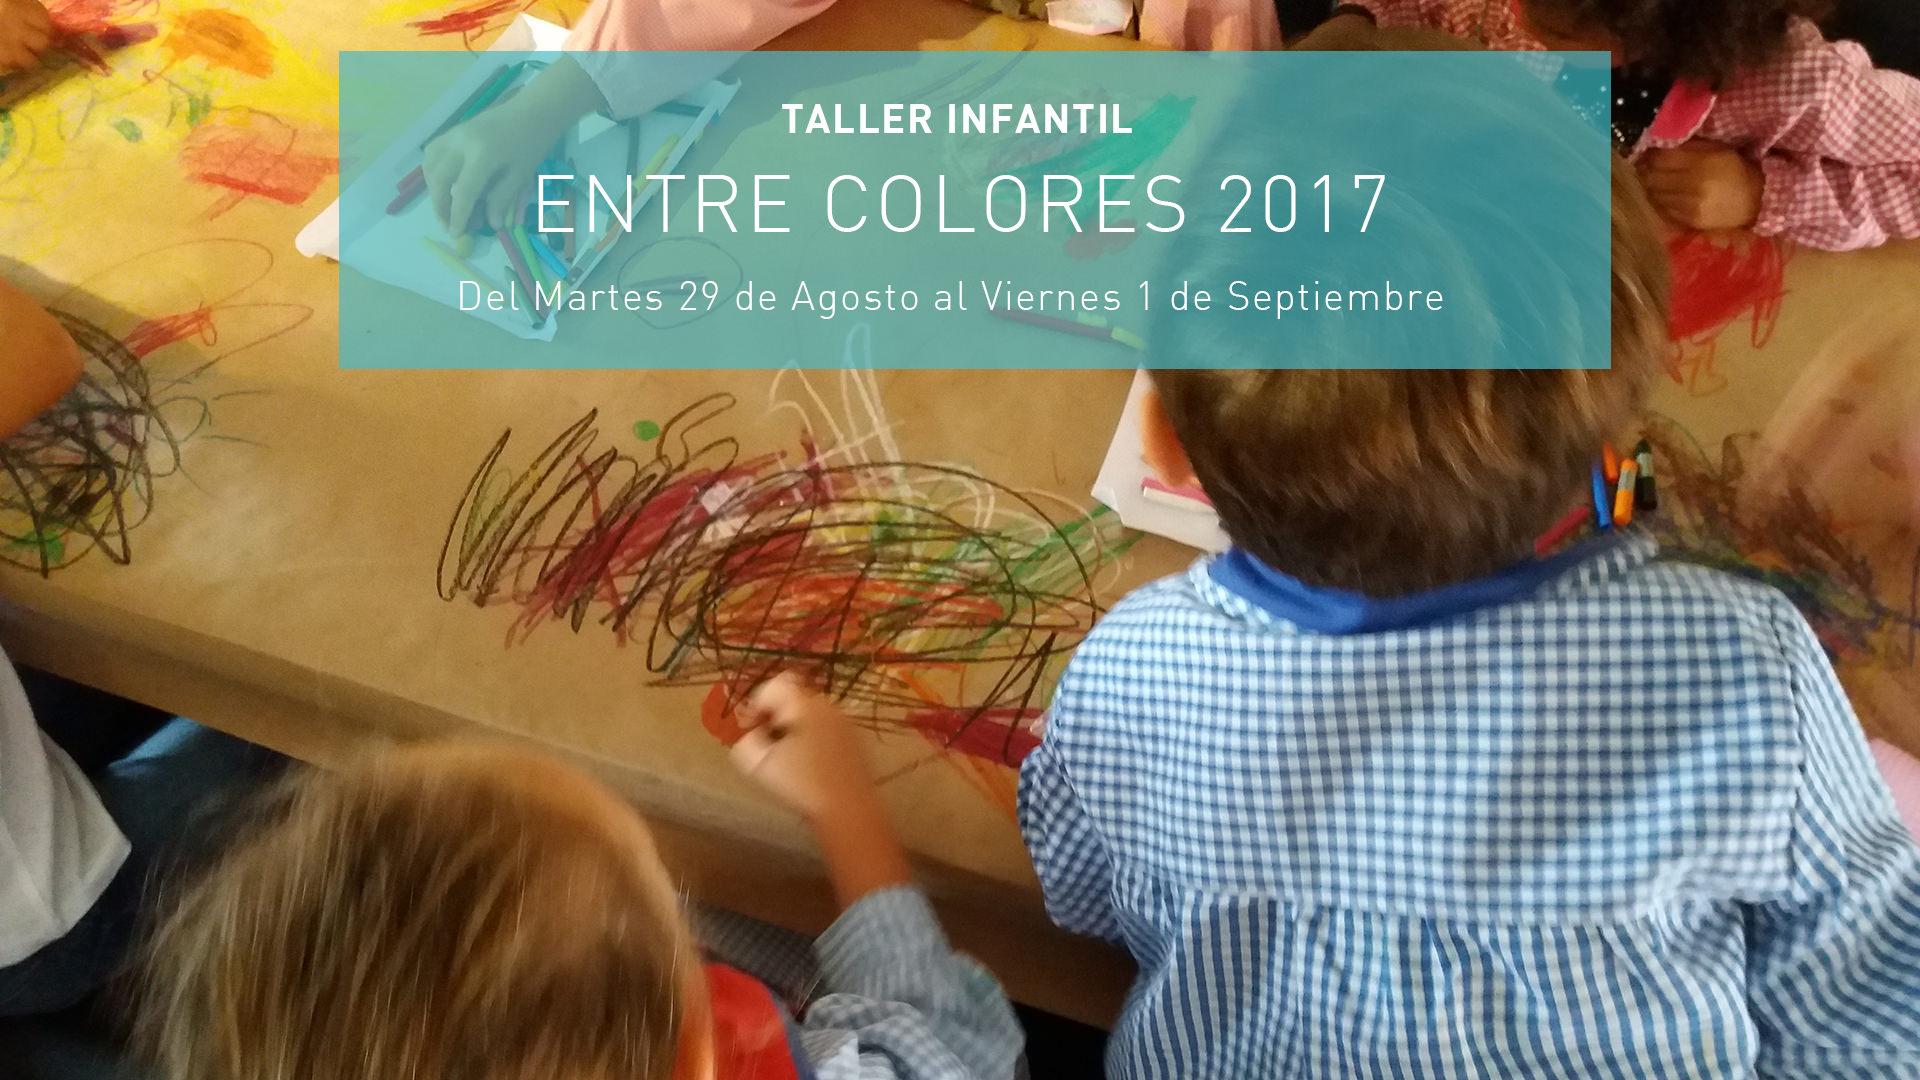 Taller infantil – Entre colores 2017